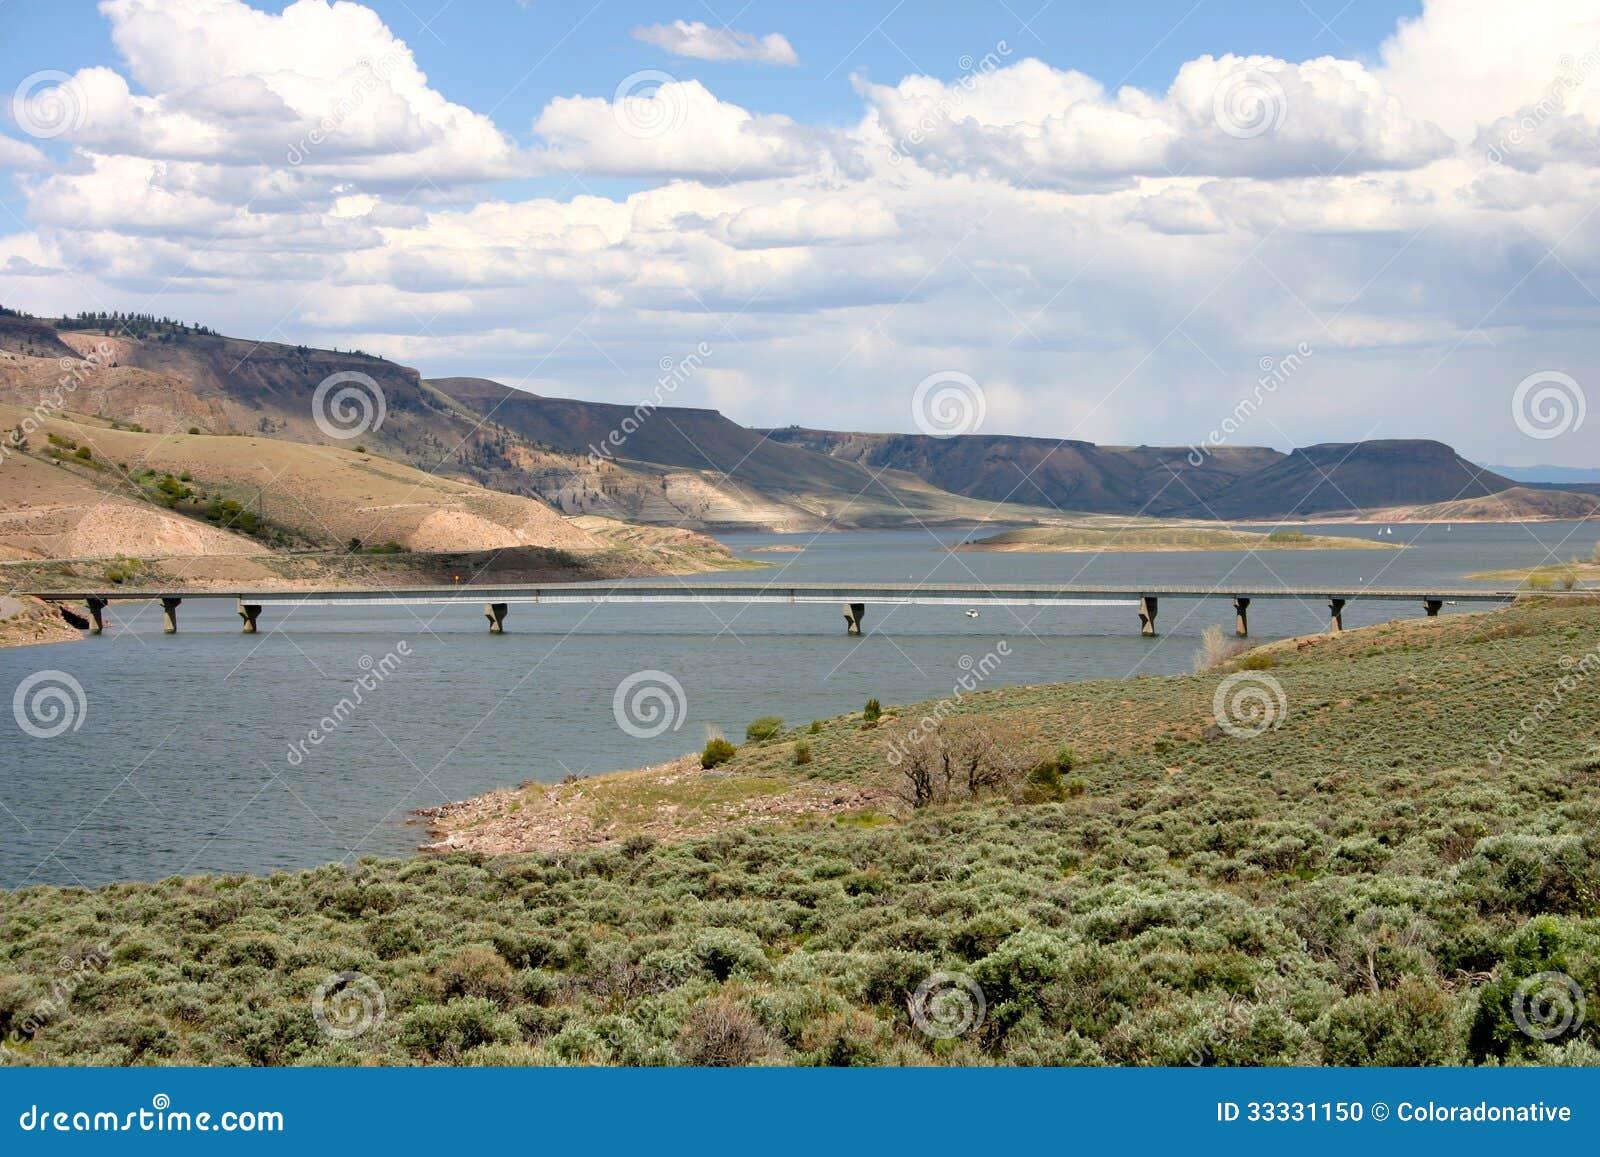 Blue mesa reservoir bridge stock photo image 33331150 for Blue mesa reservoir fishing